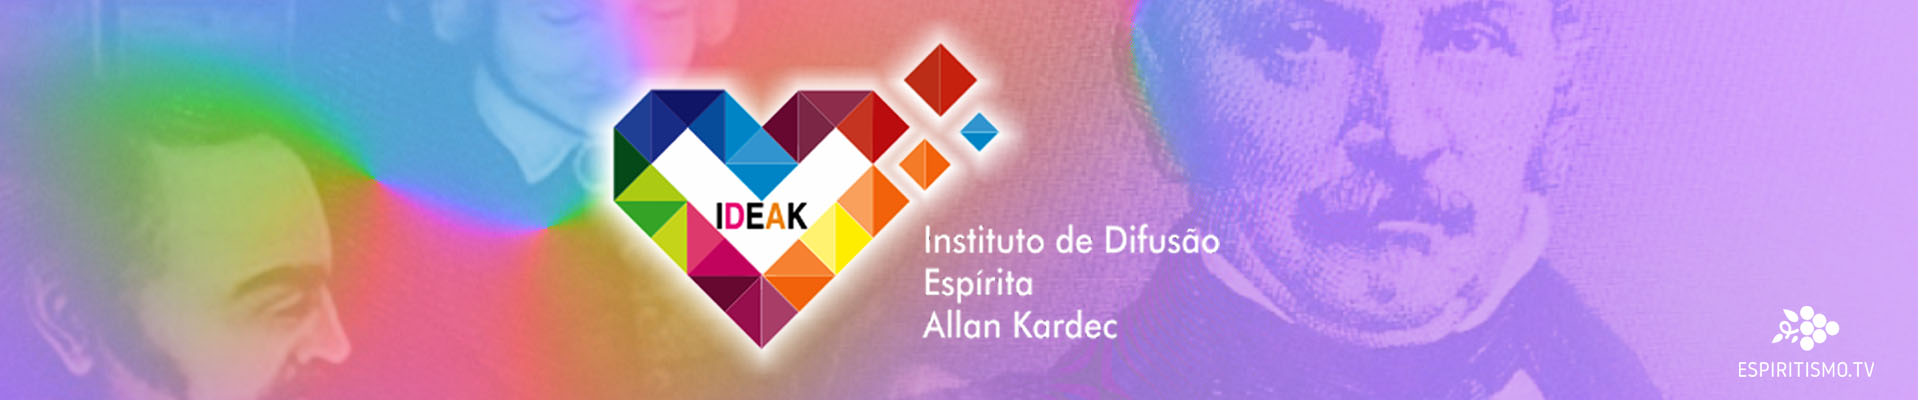 IDEAK - Instituto de Difusão Espírita Allan Kardec 1